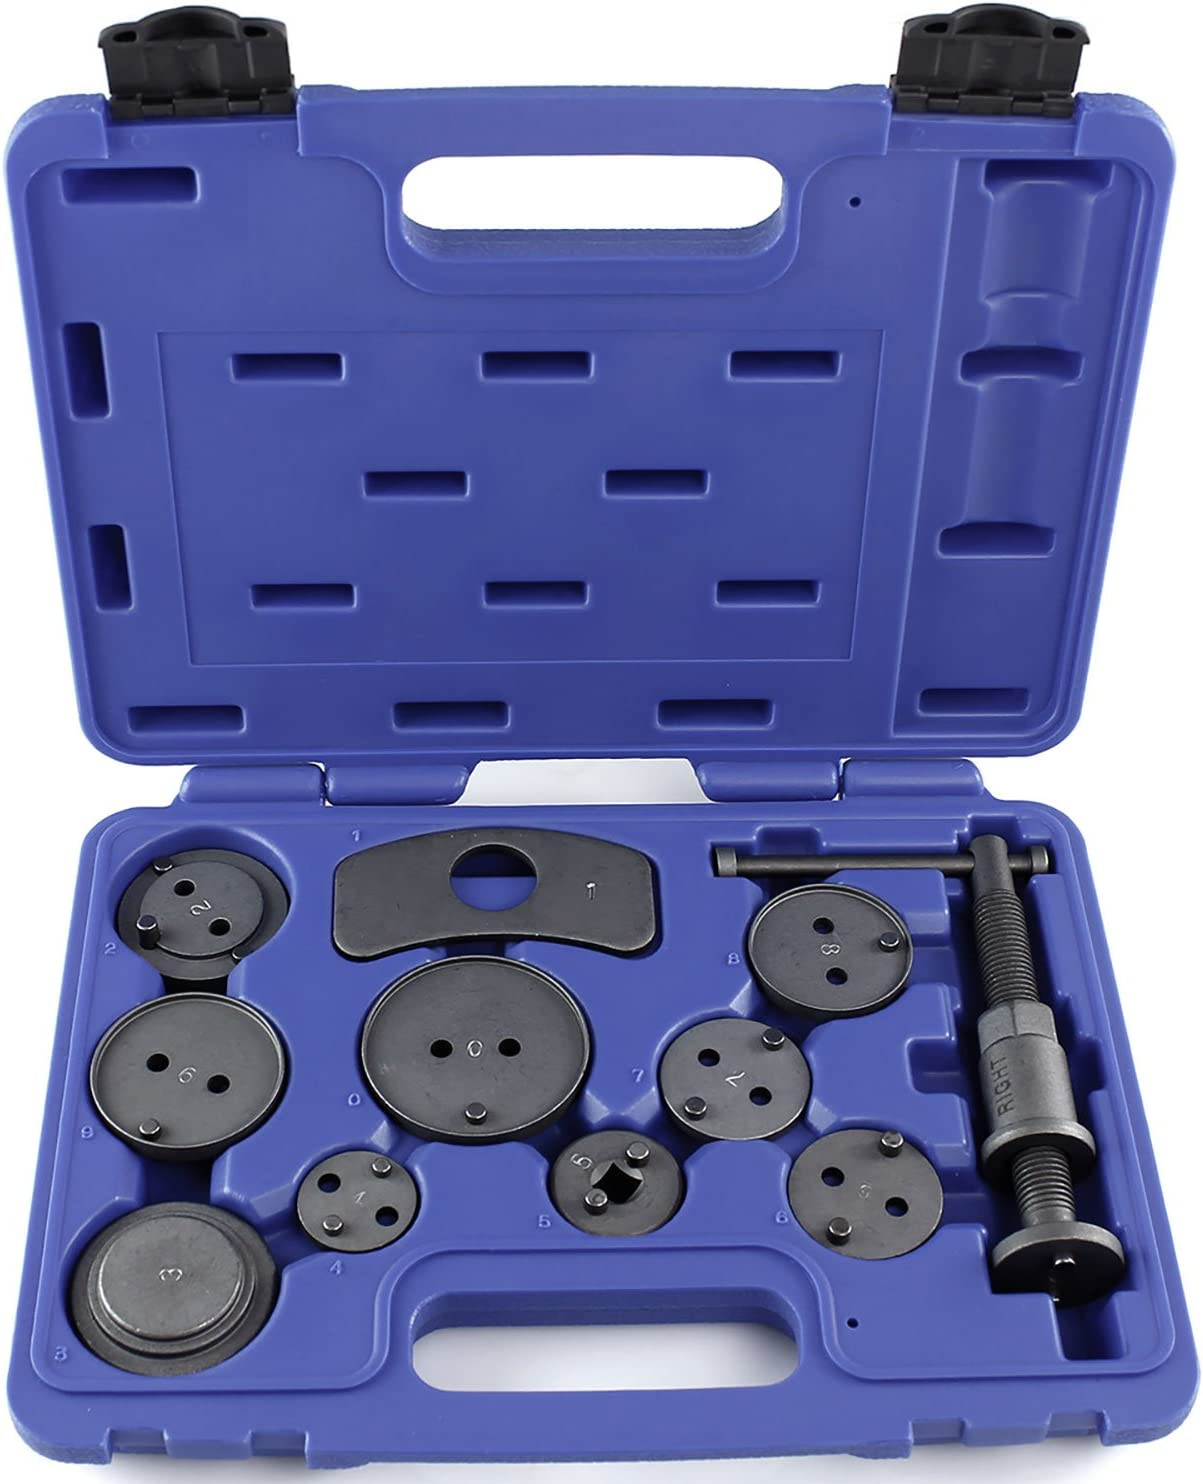 OrionMotorTech 24PCS Master Disc Brake Piston Caliper Compressor Spreader Tool Set Renewed Brake Pad Replacement Reset Wind Back Kit